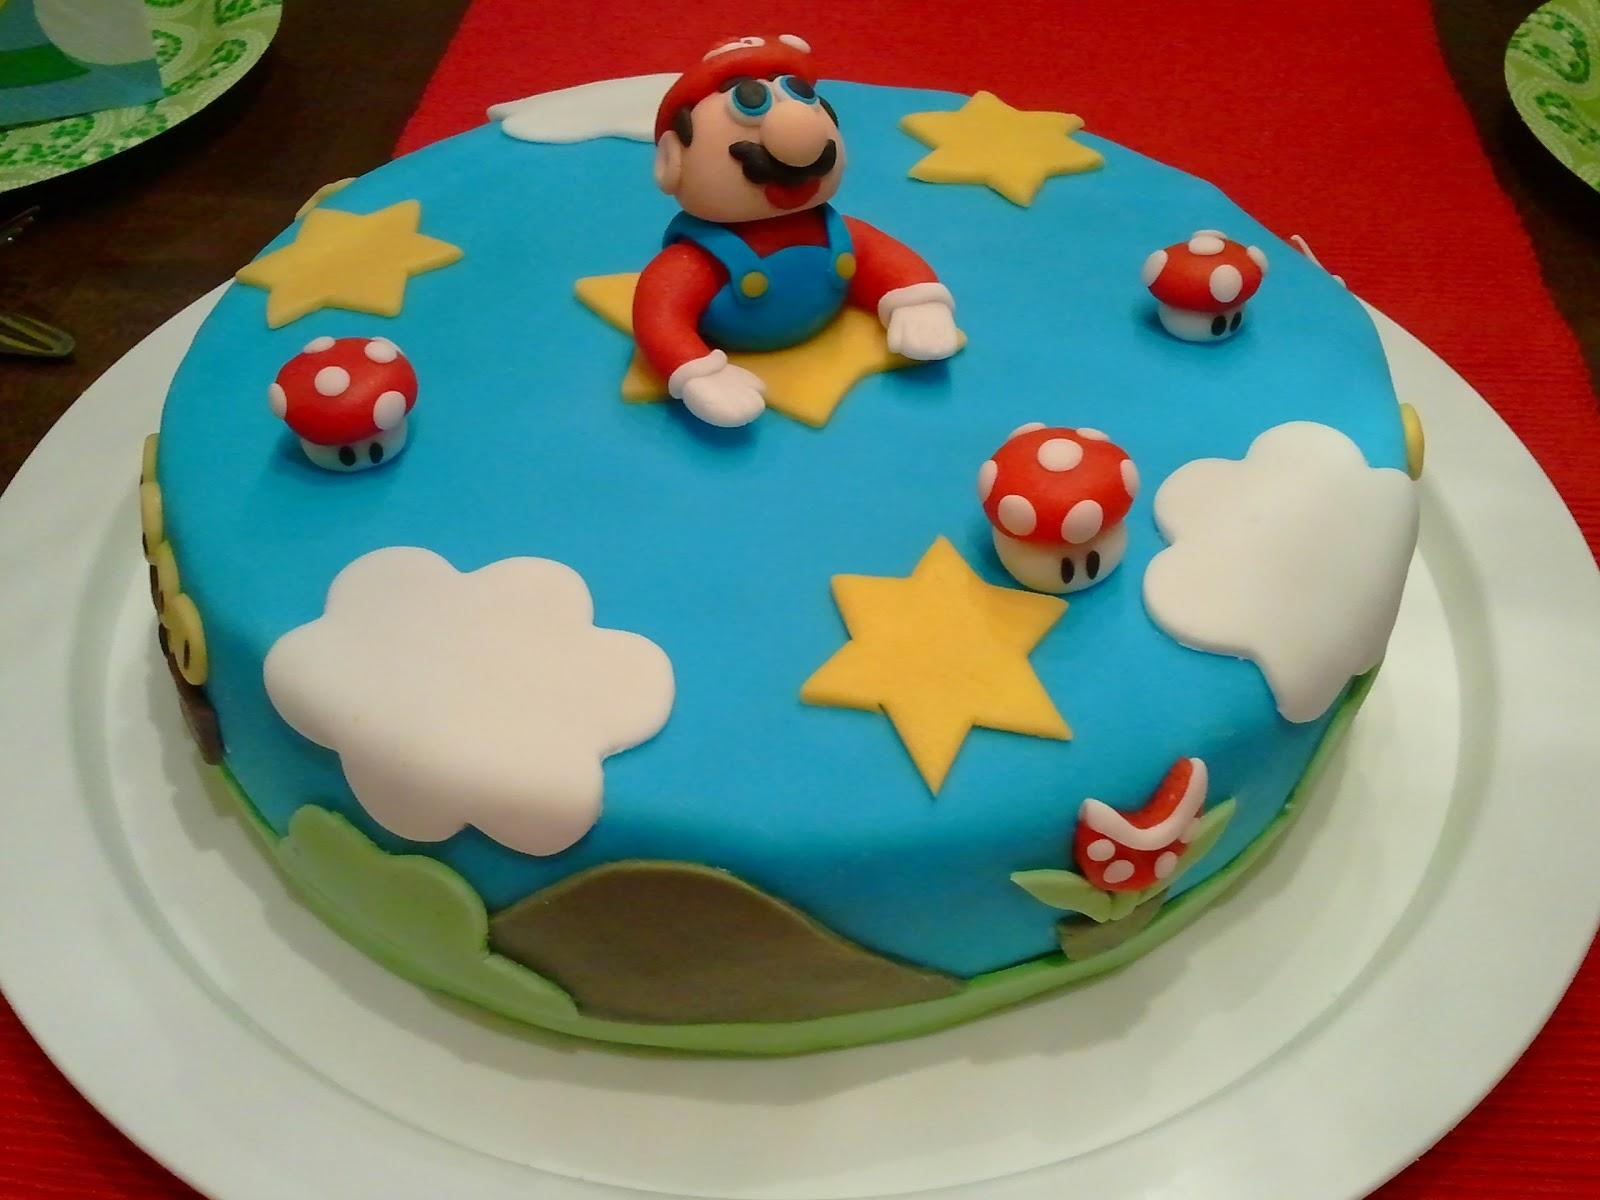 Riittalicious Super Cool Super Mario Cake And Winter Wonderland